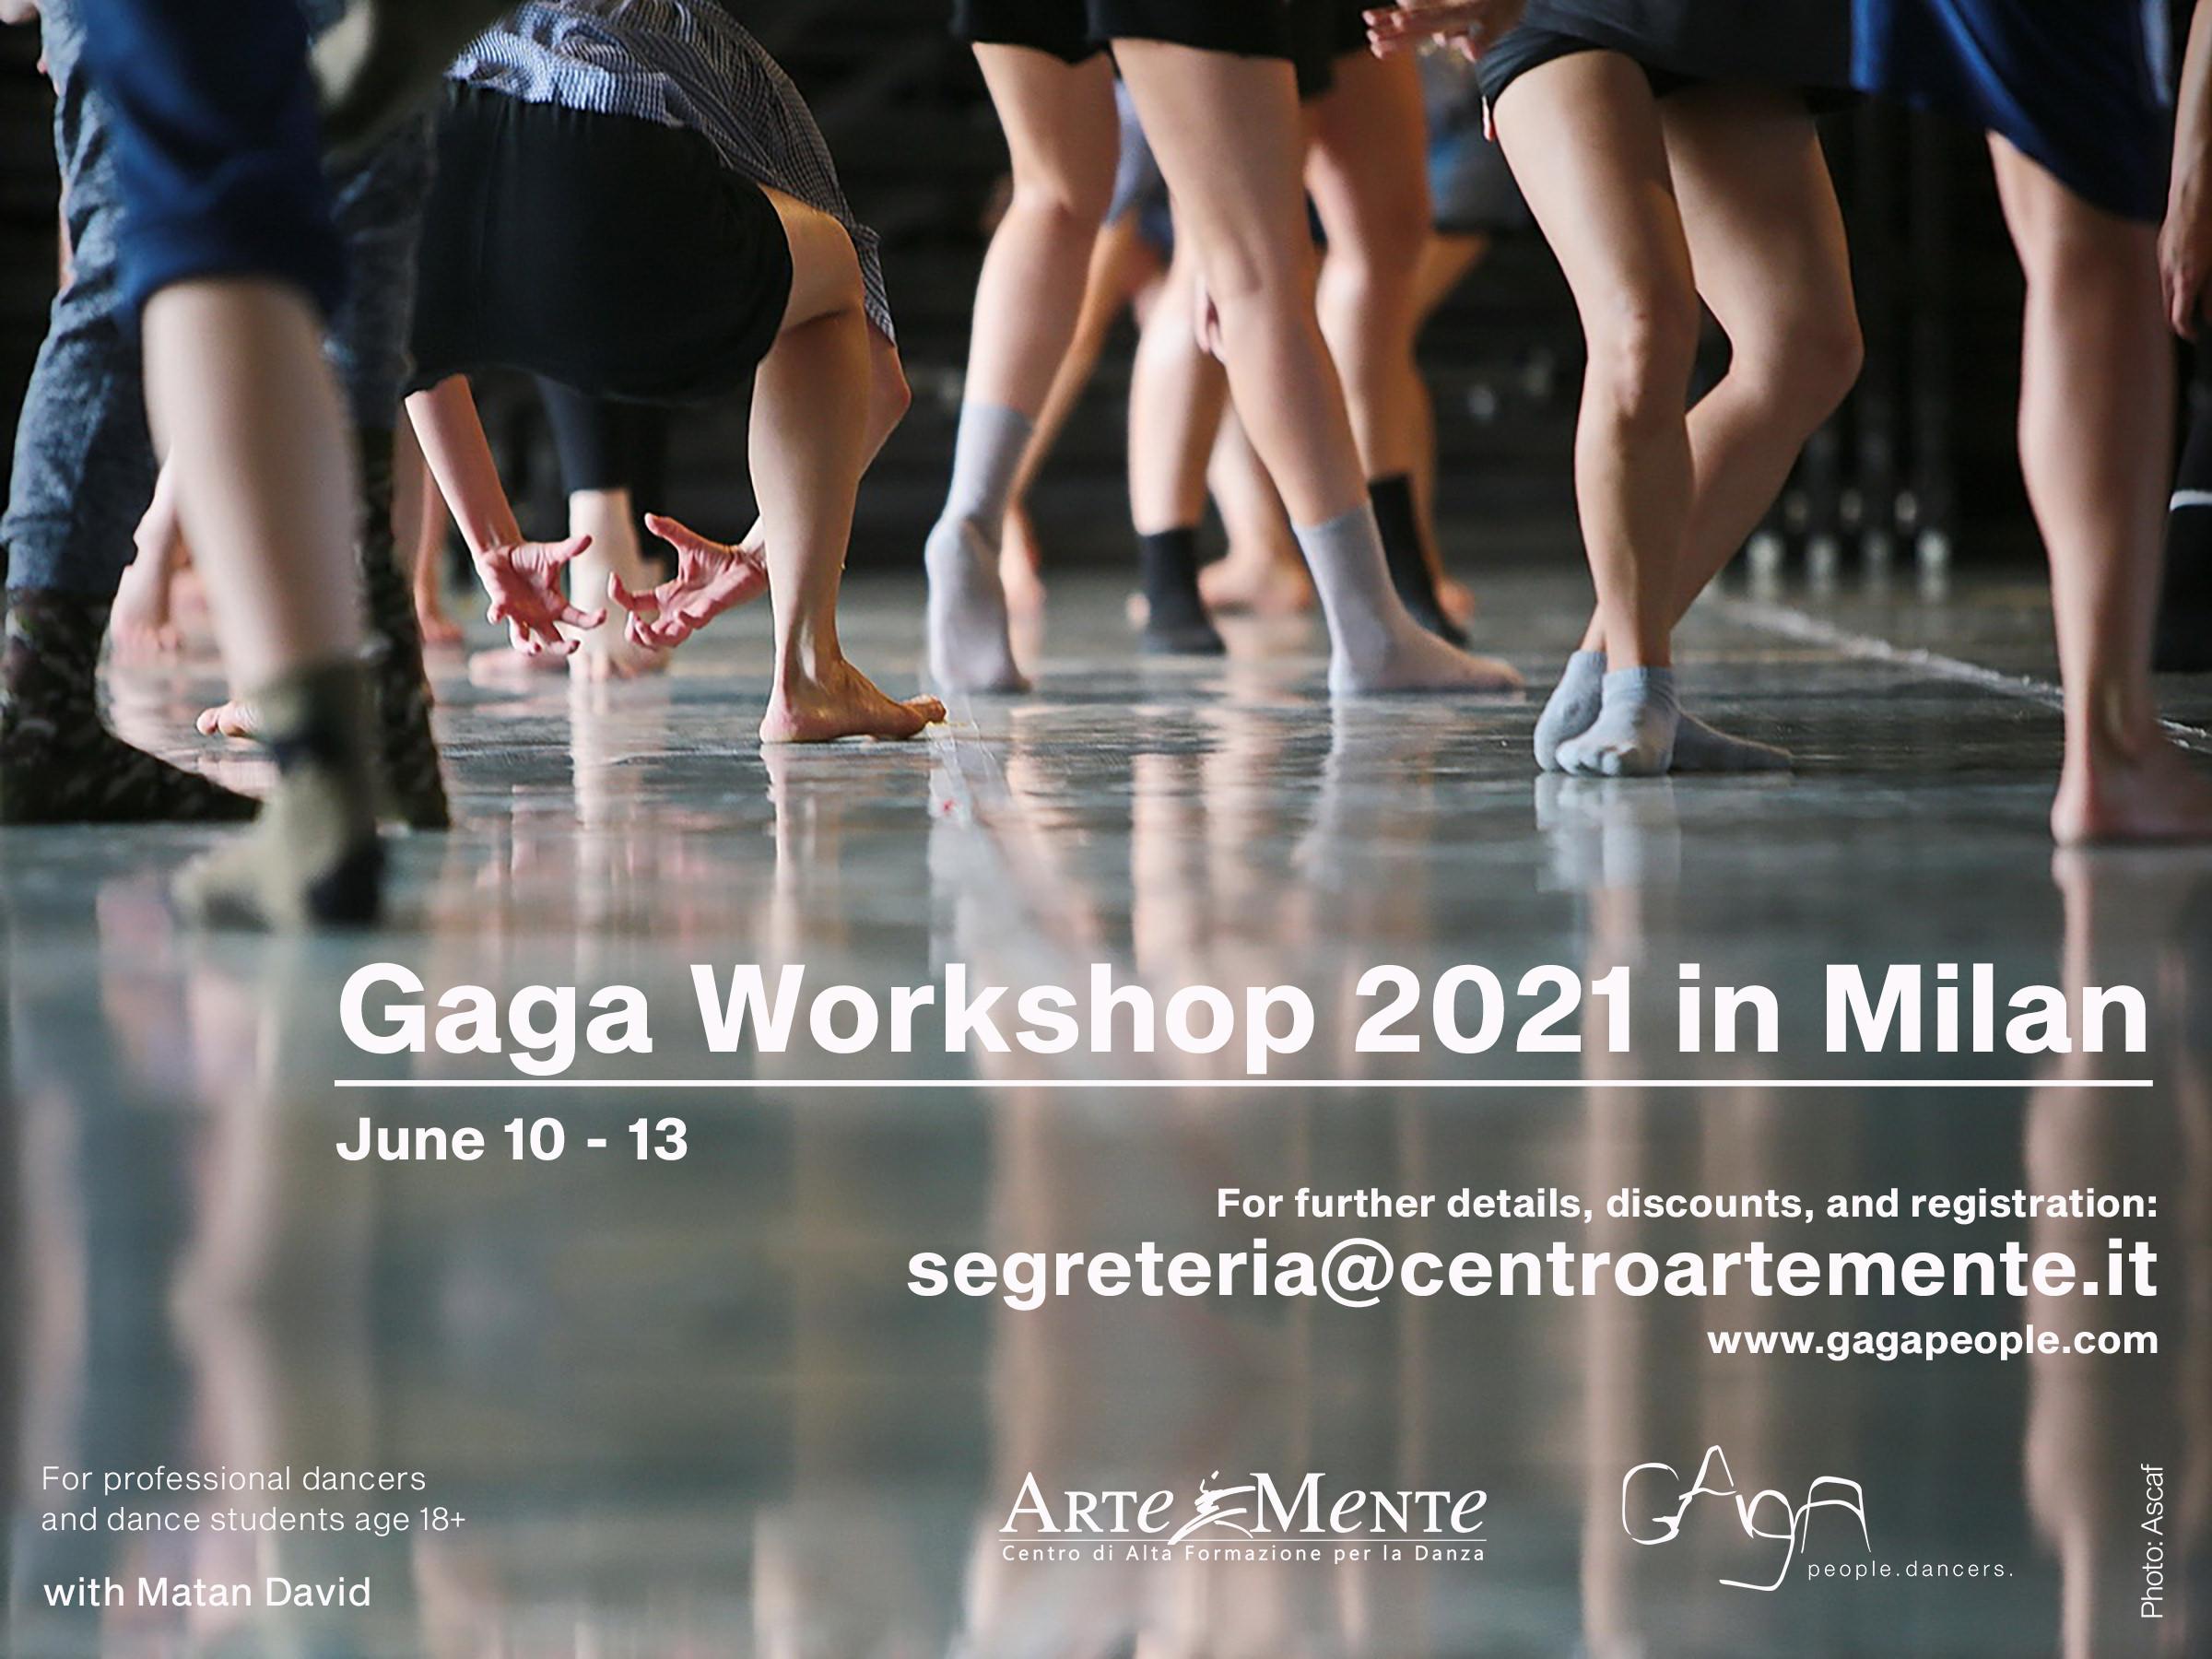 Gaga ArteMente 2021